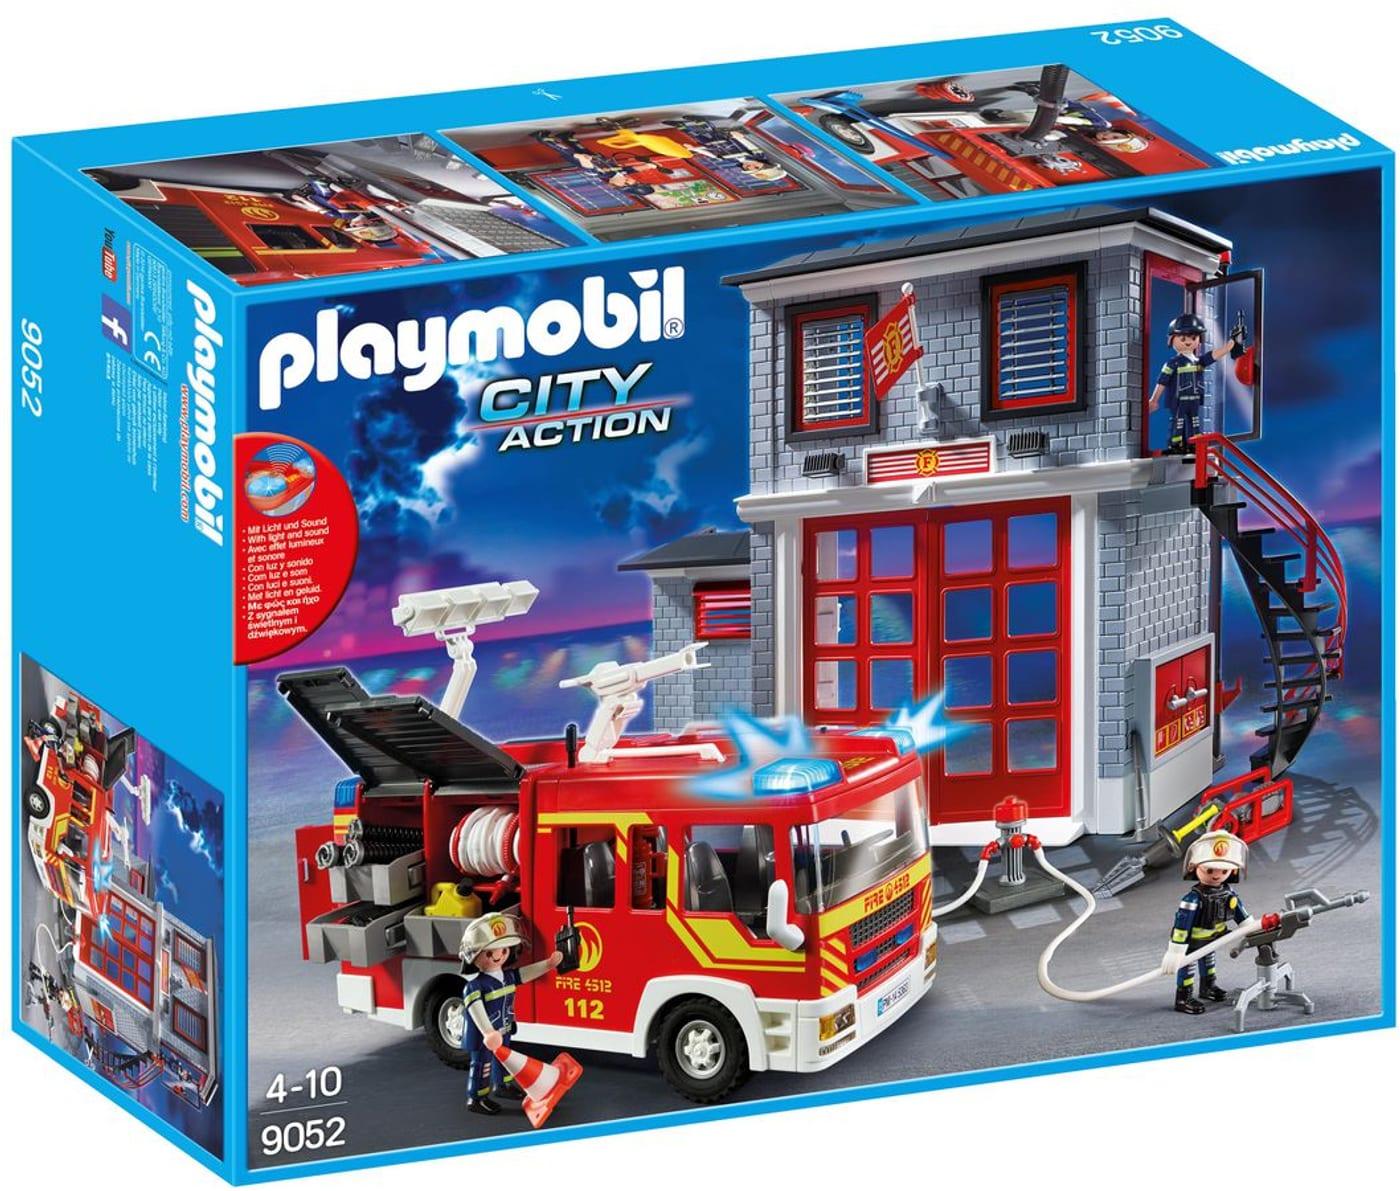 Playmobil Ausmalbilder Feuerwehr - Playmobil Mein Großes